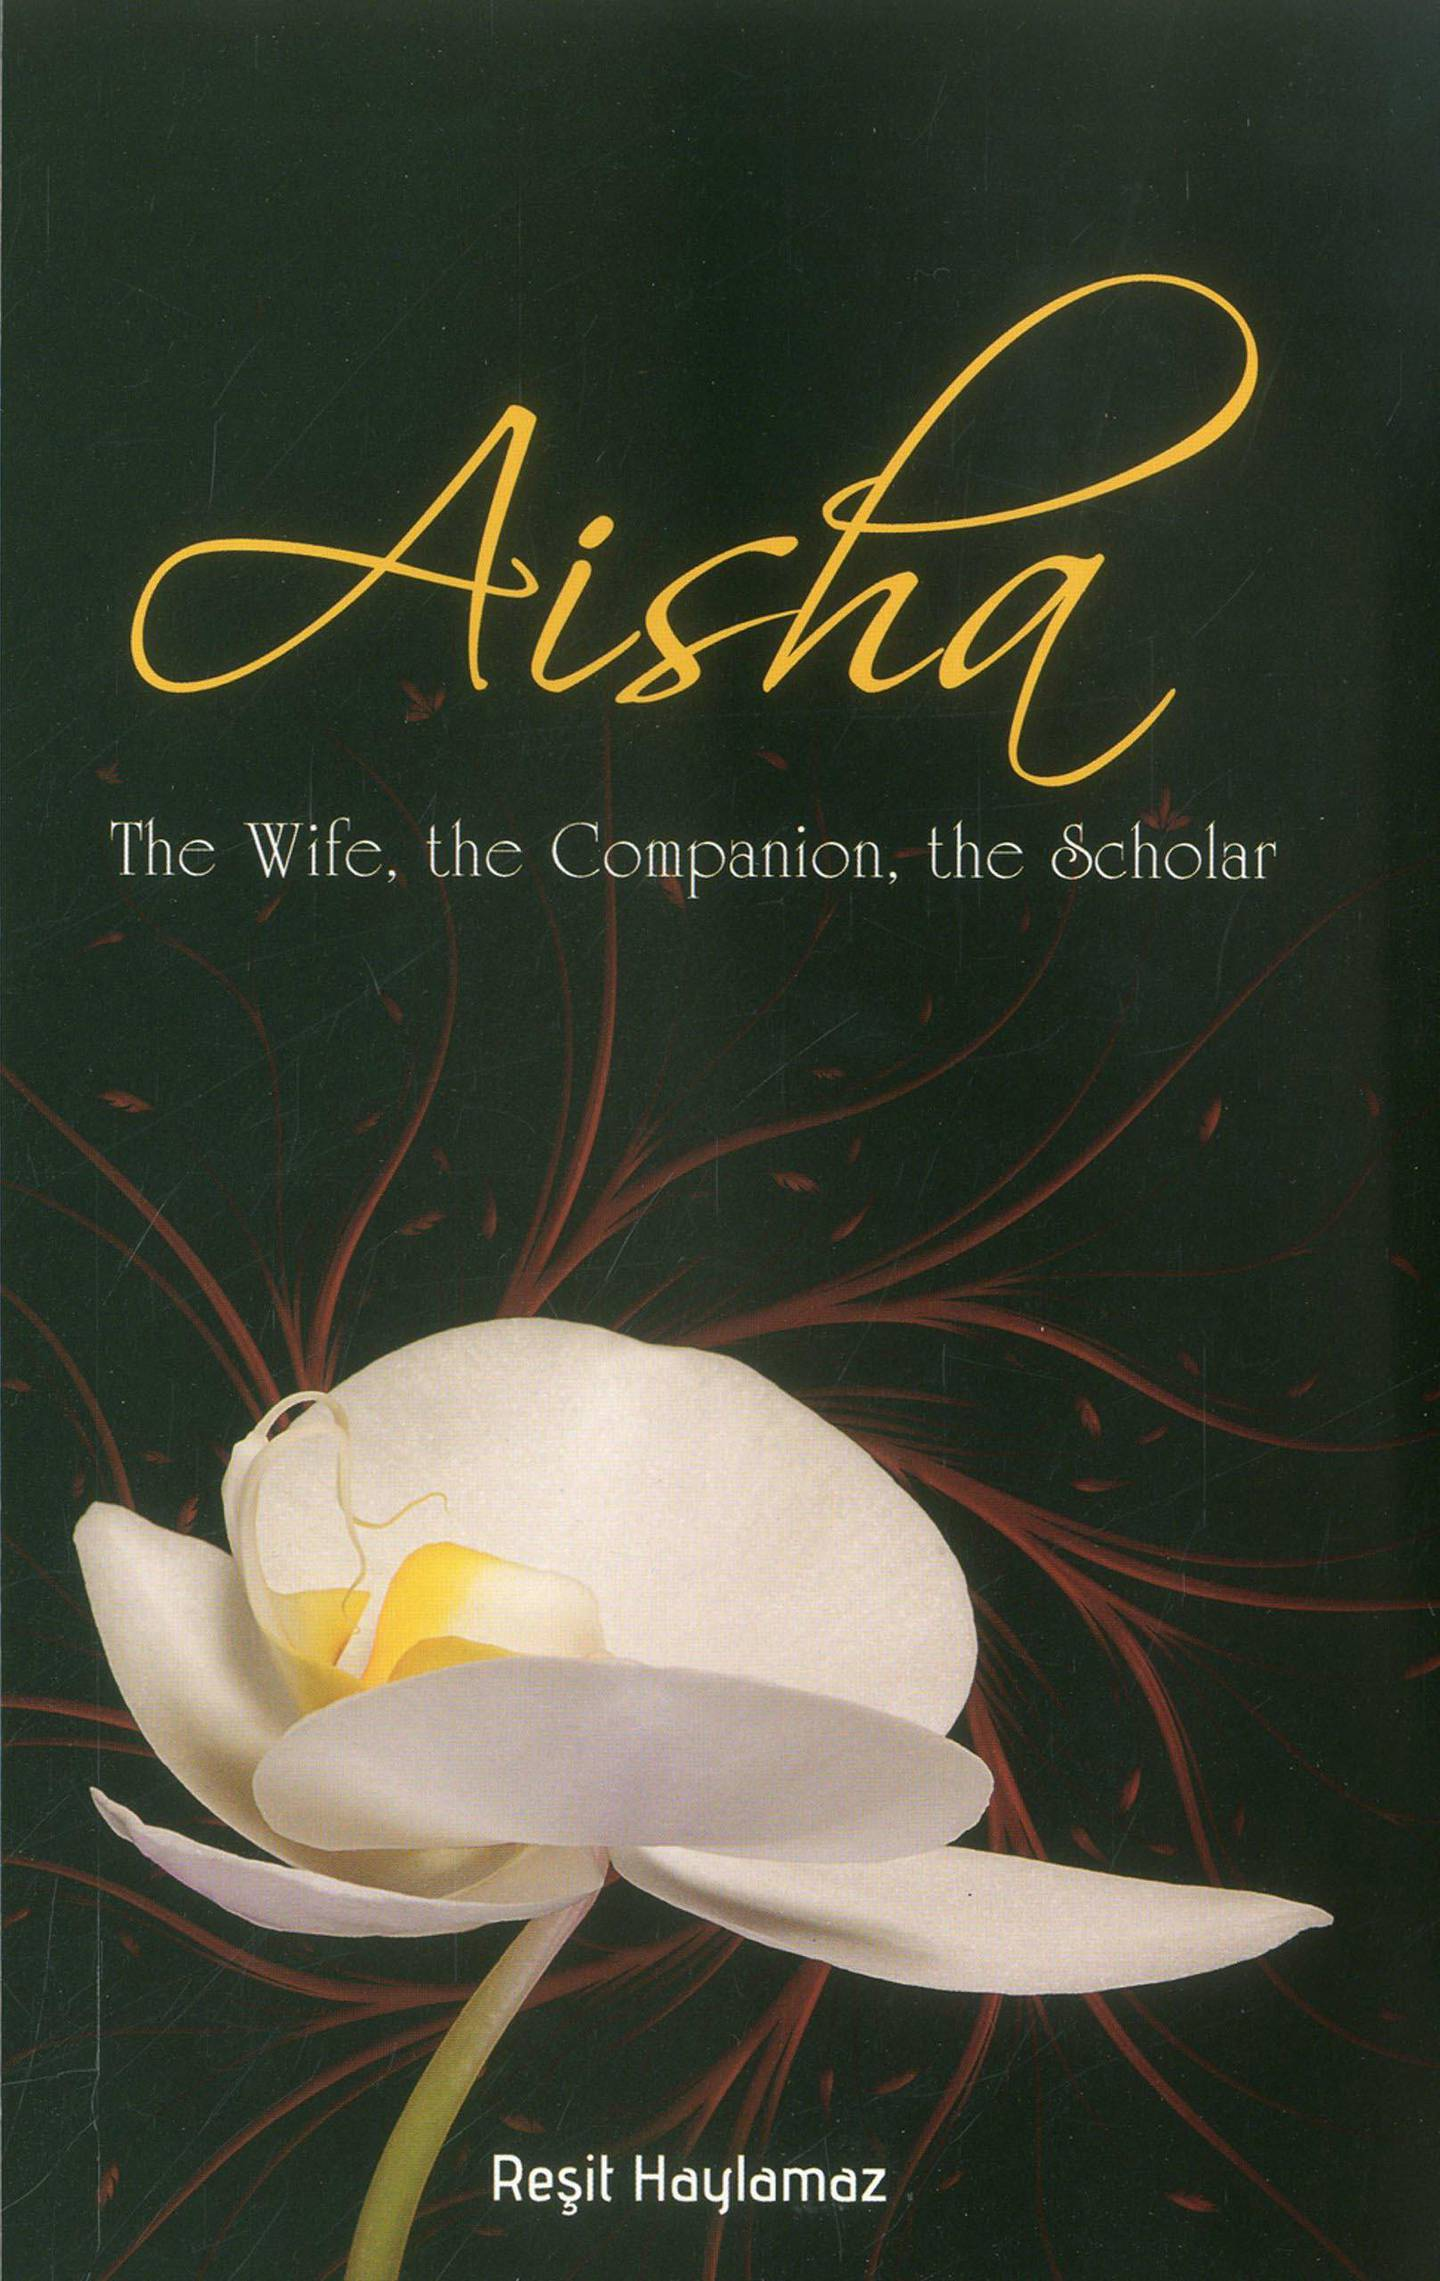 Aisha: The Wife, the Companion, the Scholar by Resit Haylamaz. Courtesy Tughra Books